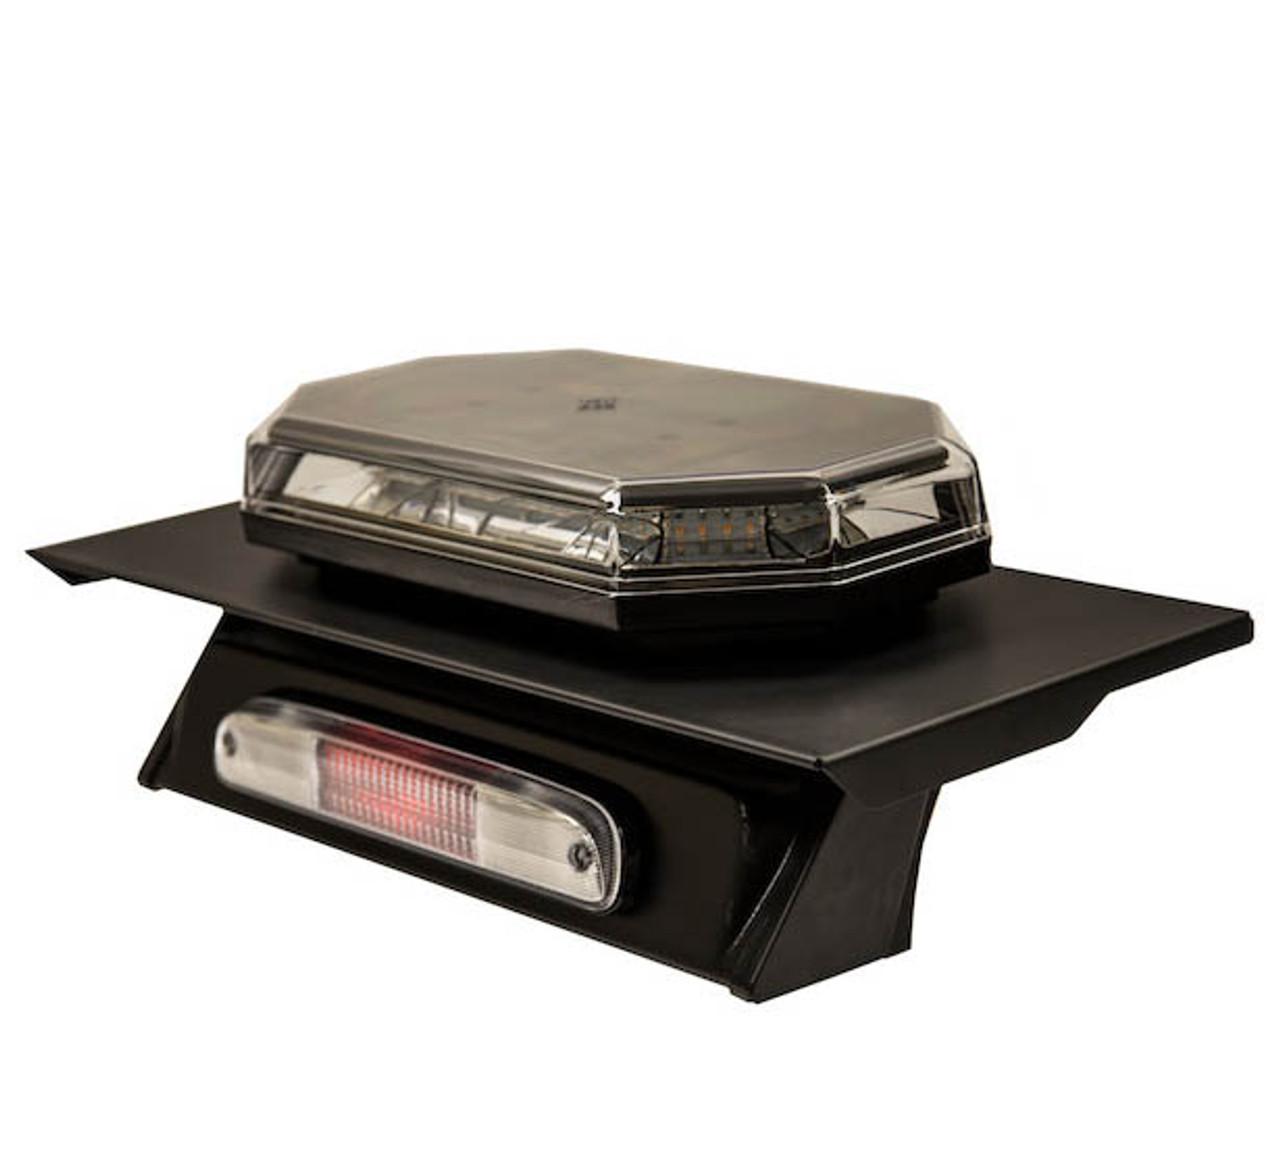 8895150 --- Fleet Series Drill-Free Light Bar Cab Mount - Aluminum Cabs